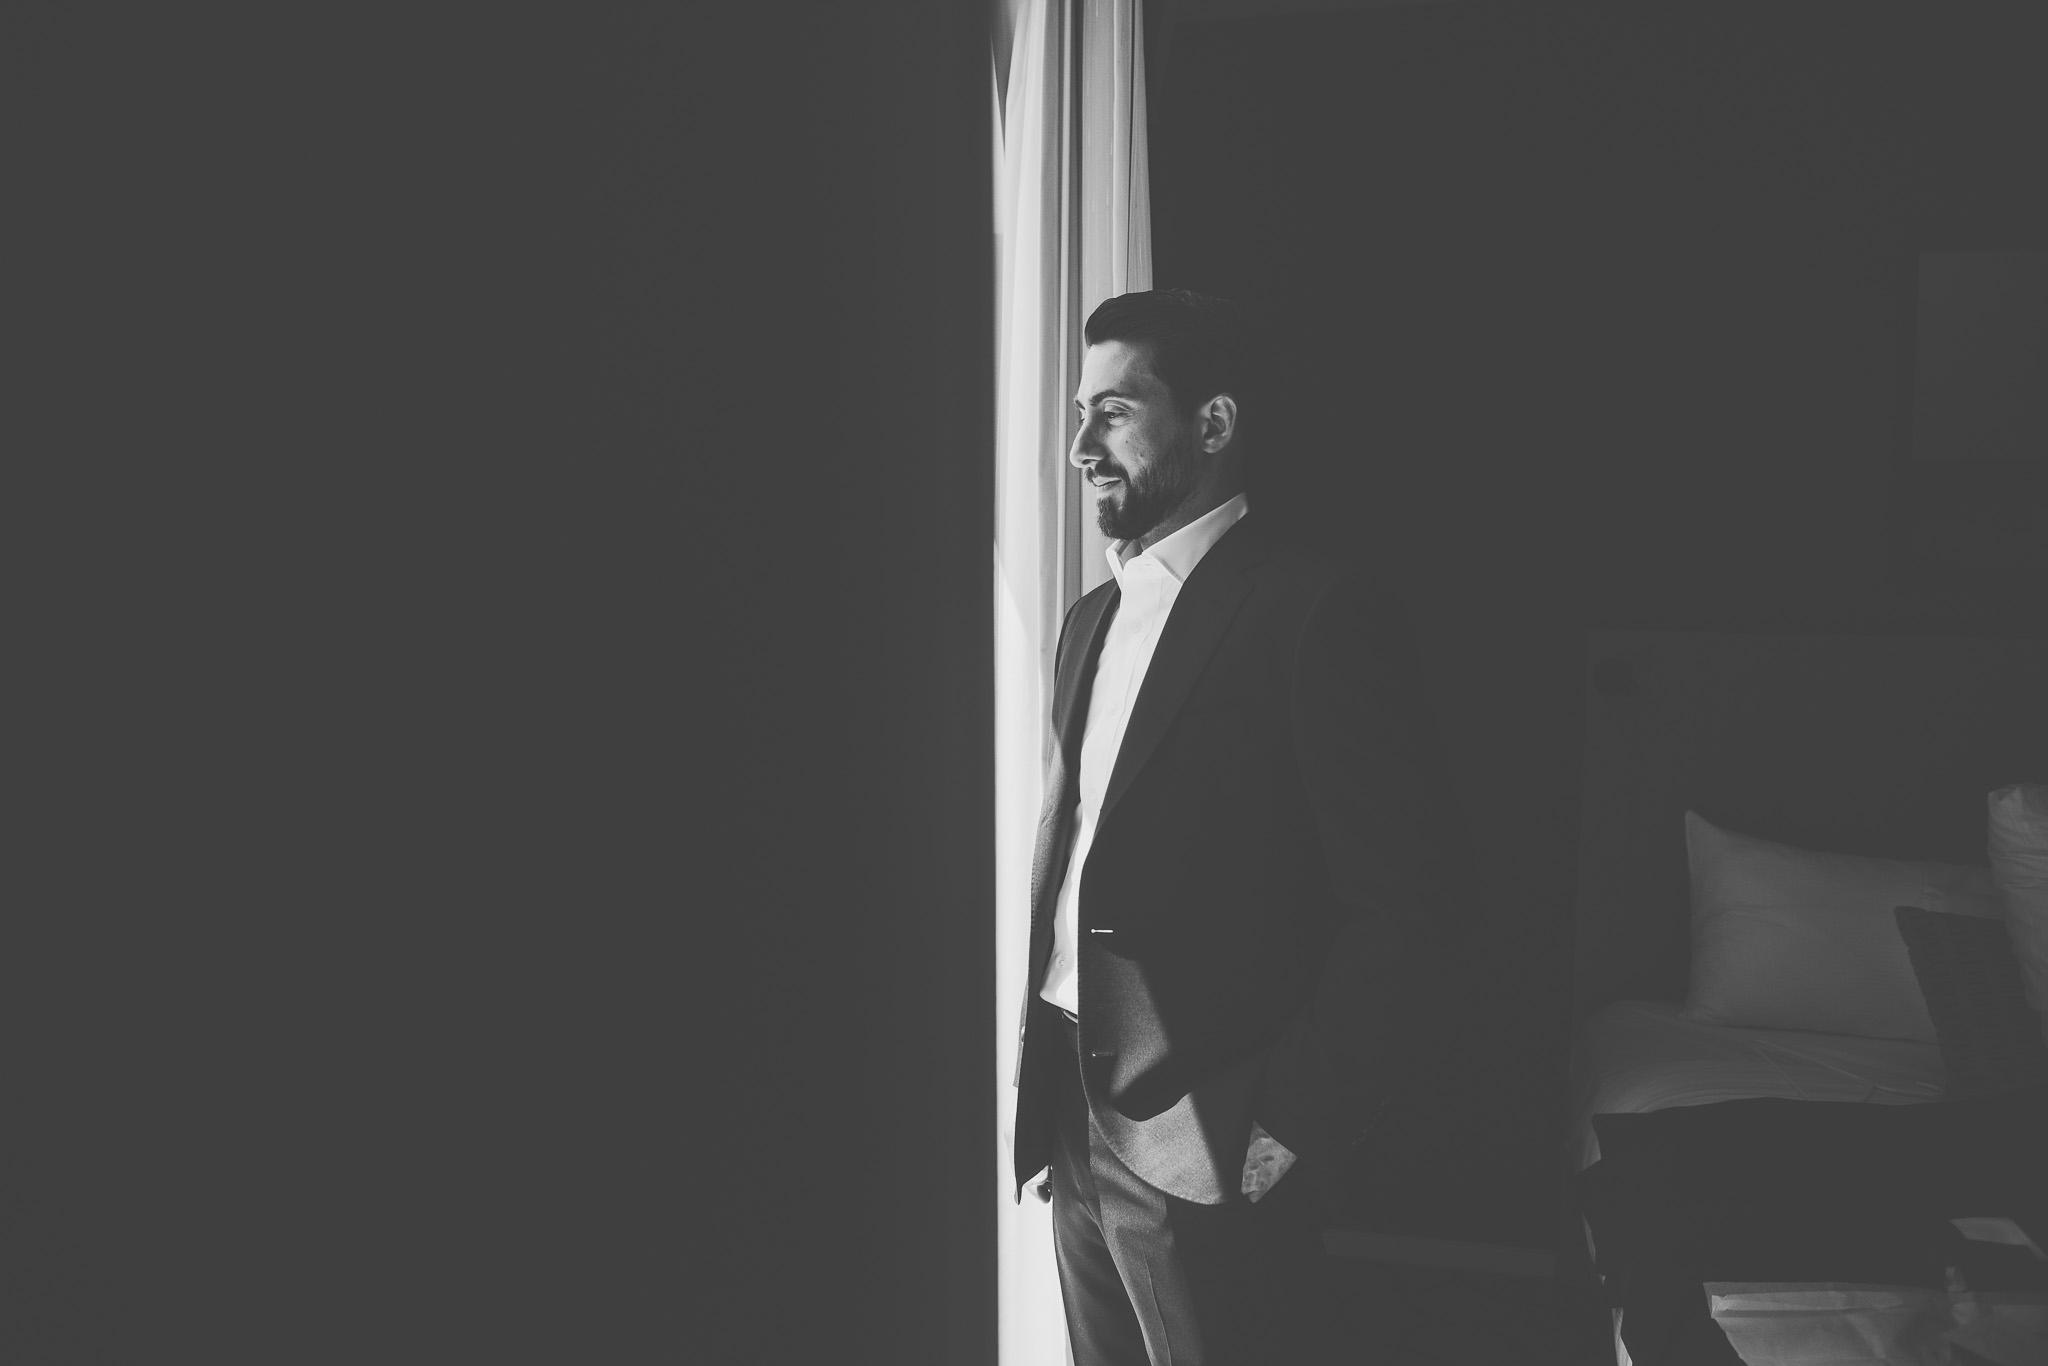 Downtown Toronto wedding, Toronto Wedding, Toronto Wedding Photographer, Downtown Toronto, Toronto Photographer, Berkeley Church, Berkeley Events, Berkeley fieldhouse, Groom, Groom getting ready, bowtie, cigar, black and white, portrait, window light, dramatic, groom getting dressed